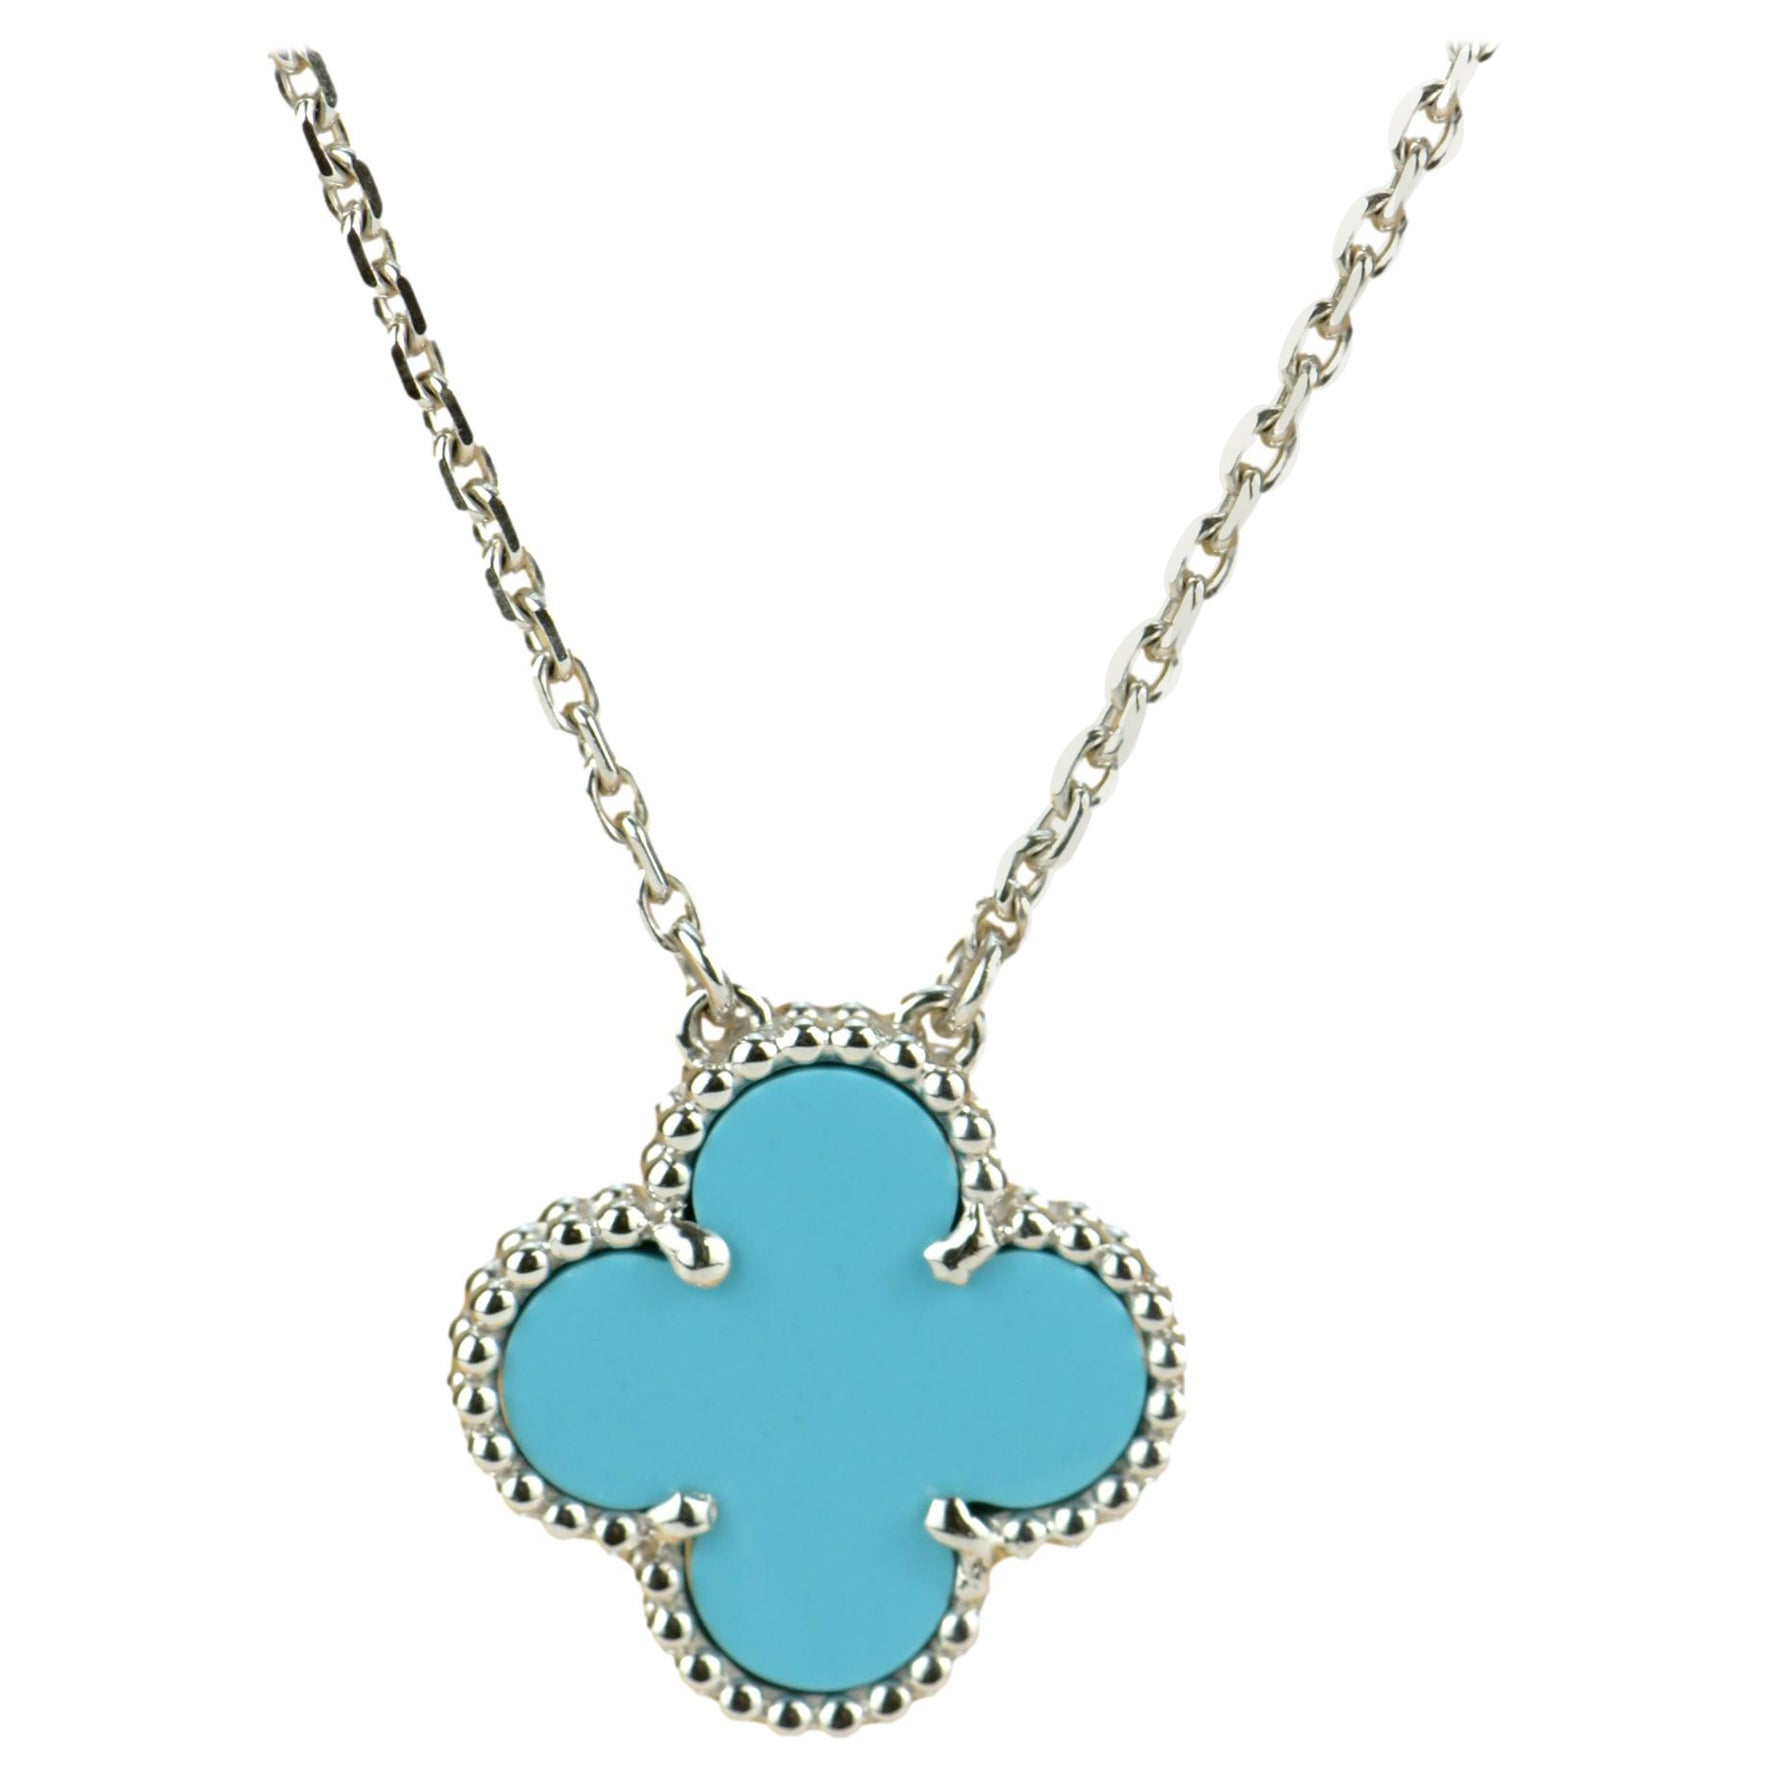 Van Cleef & Arpels Vintage Turquoise Alhambra Pendant Necklace